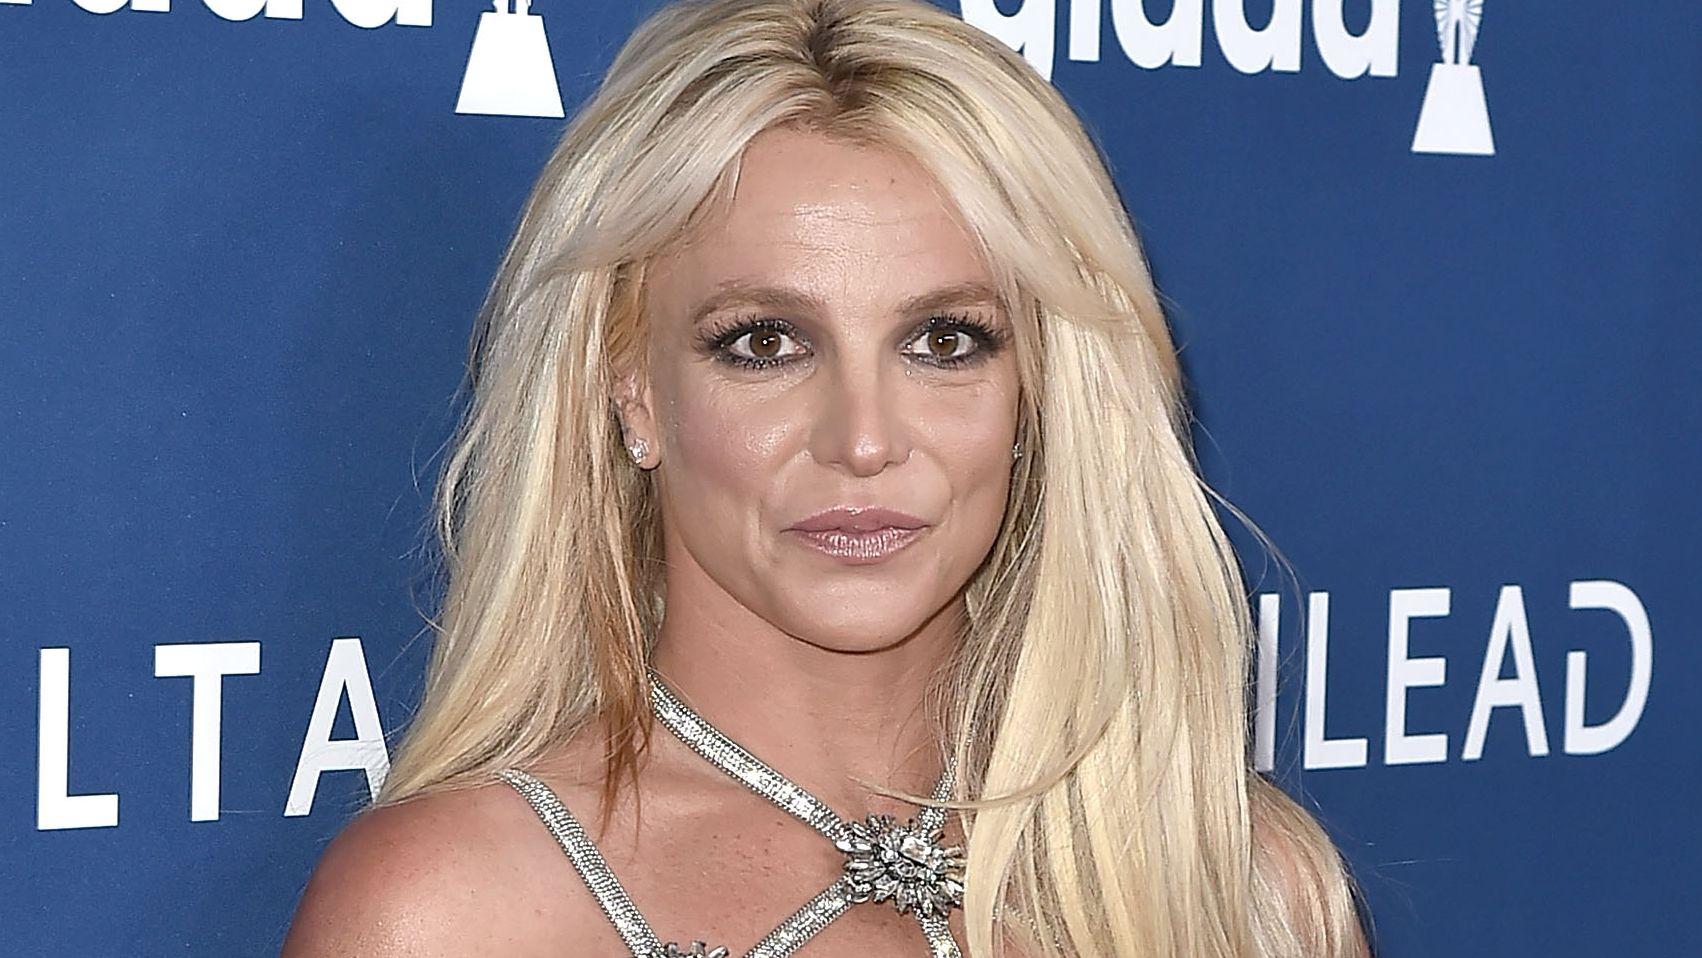 Britney Spears Rebelling Against Dad Jamie Spears Amid Conservatorship Battle